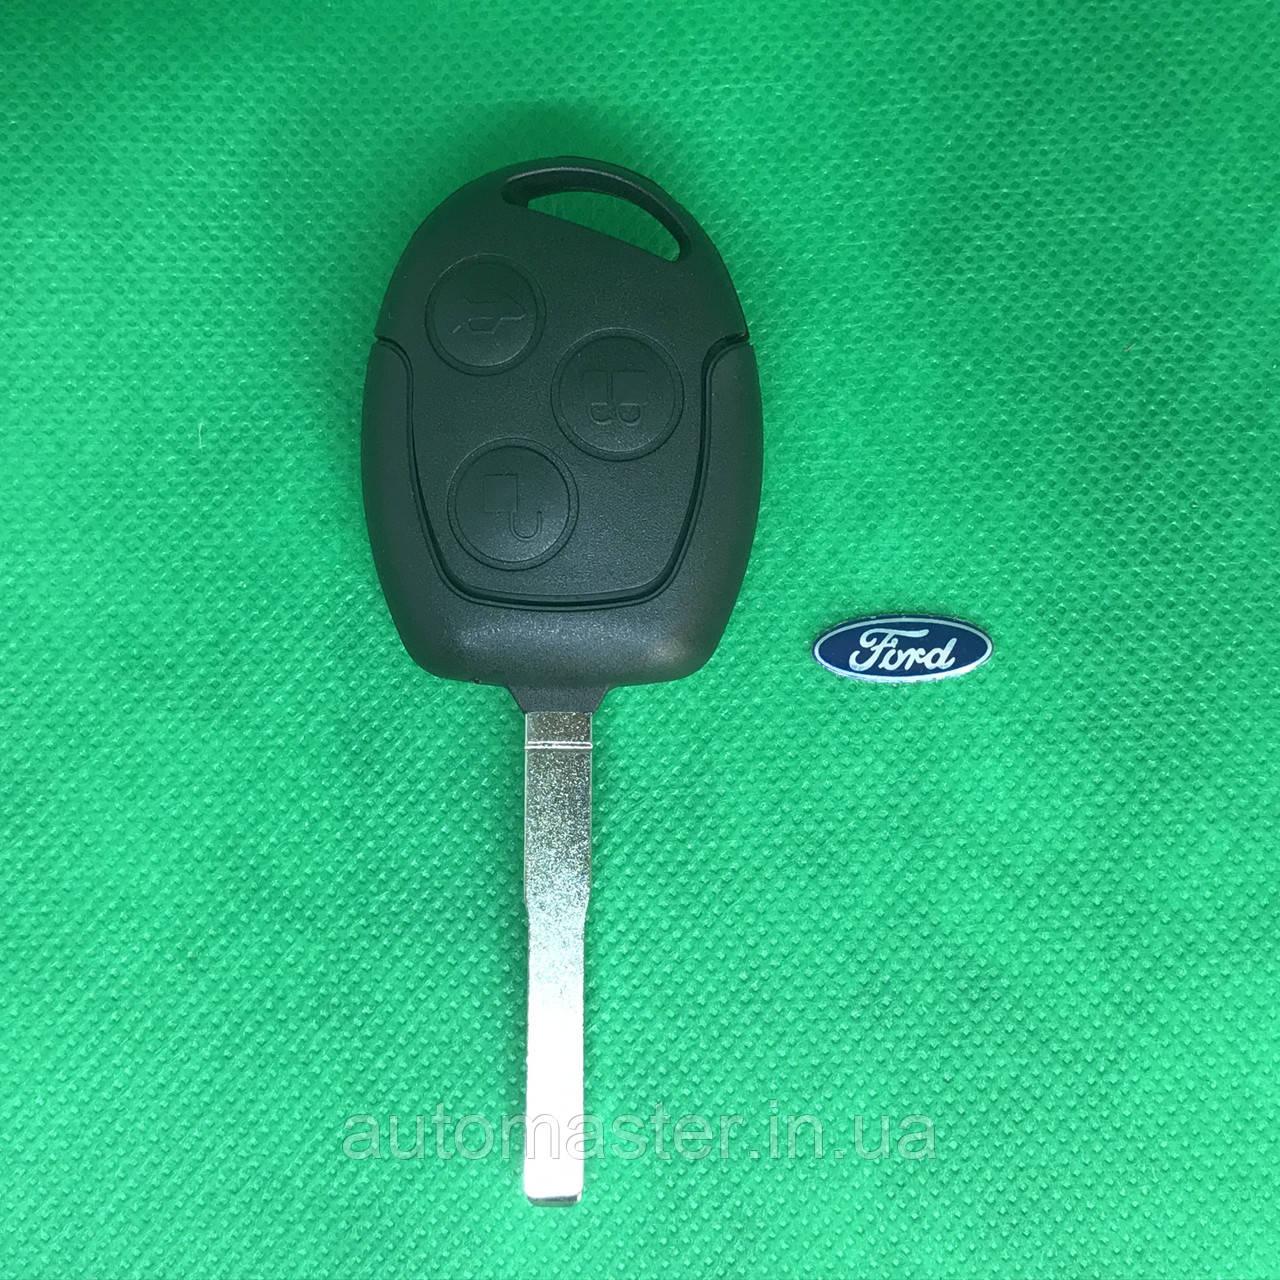 Корпус ключа для Ford (Форд) Focus, Fiesta, Фокус , Фиеста 3 - кнопки, лезвие HU101